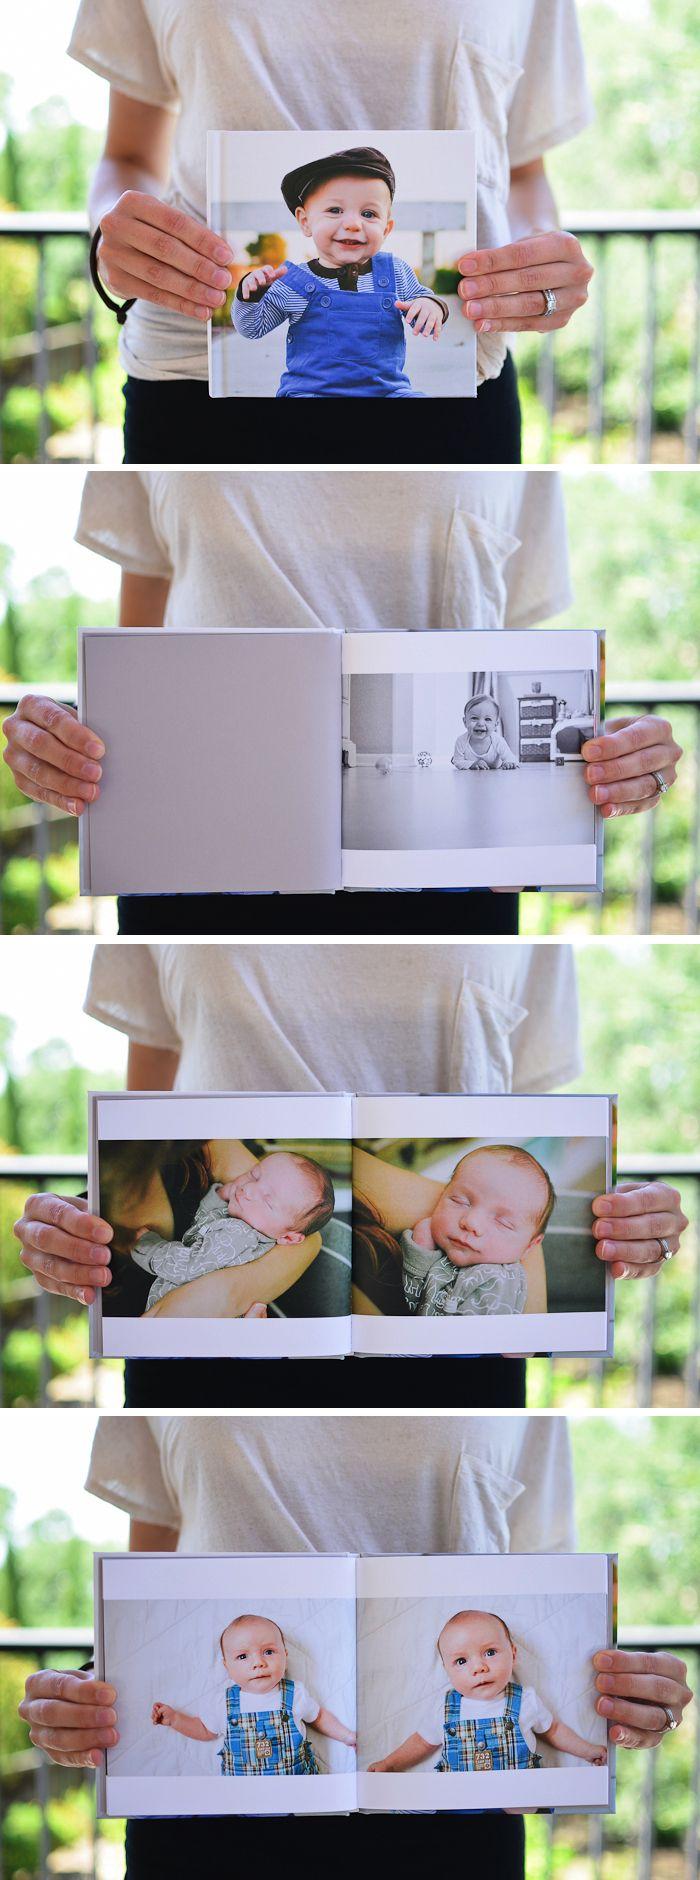 First year photo book! Love this idea.